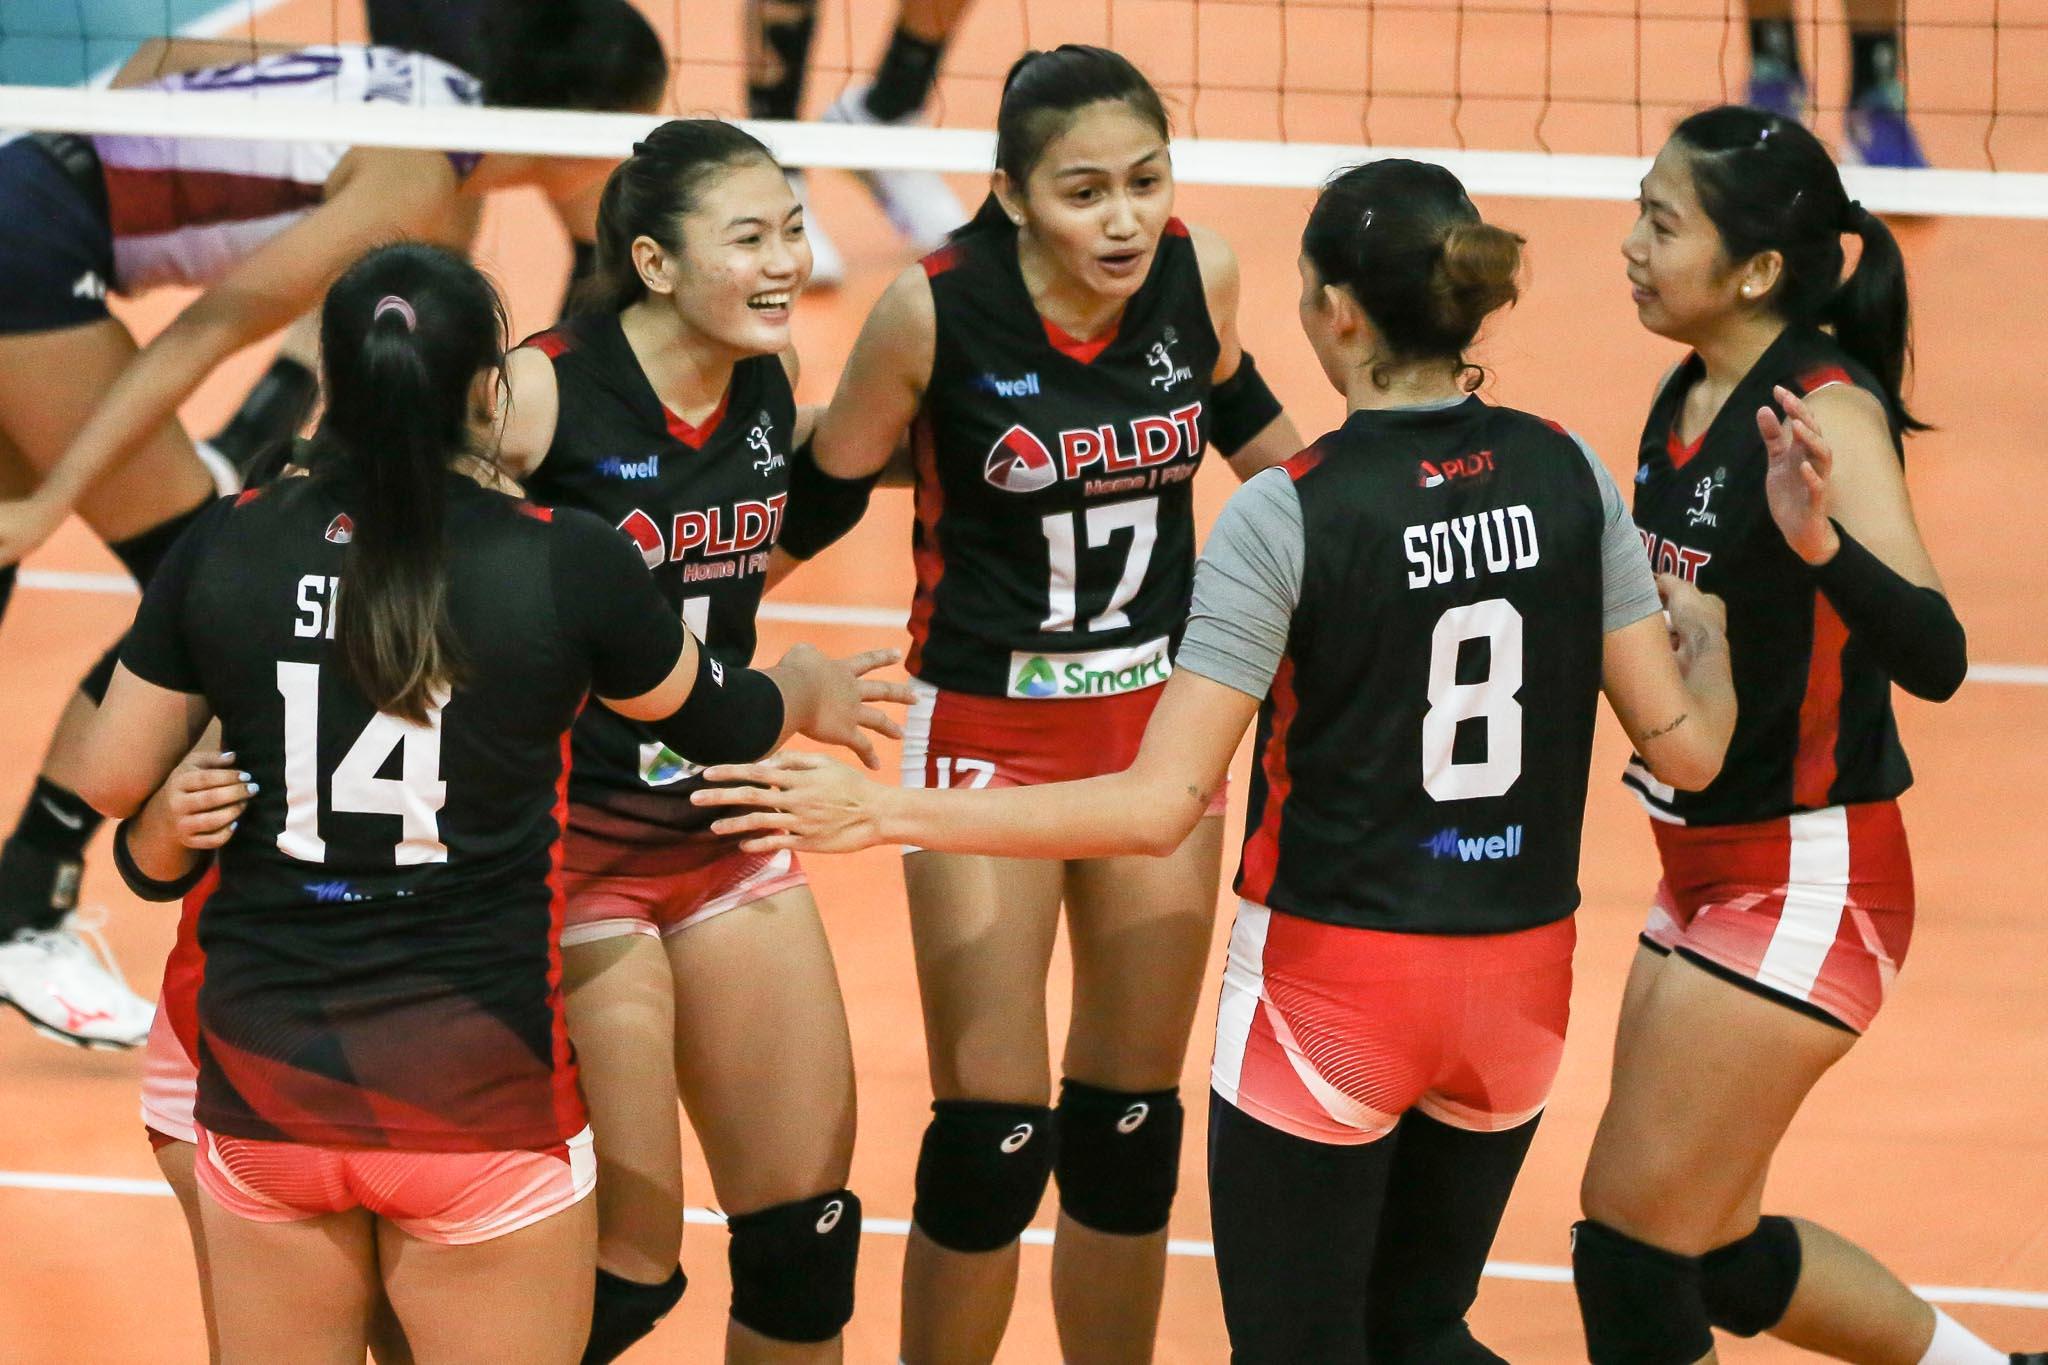 2021-PVL-Open-PLDT-vs-Choco-Mucho-Isa-Molde-x-Joyce-Sta-Rita-x-Rhea-Dimaculangan Gorayeb likens PLDT to early Fab 5-era Ateneo: 'Puro bata kami' News PVL Volleyball  - philippine sports news